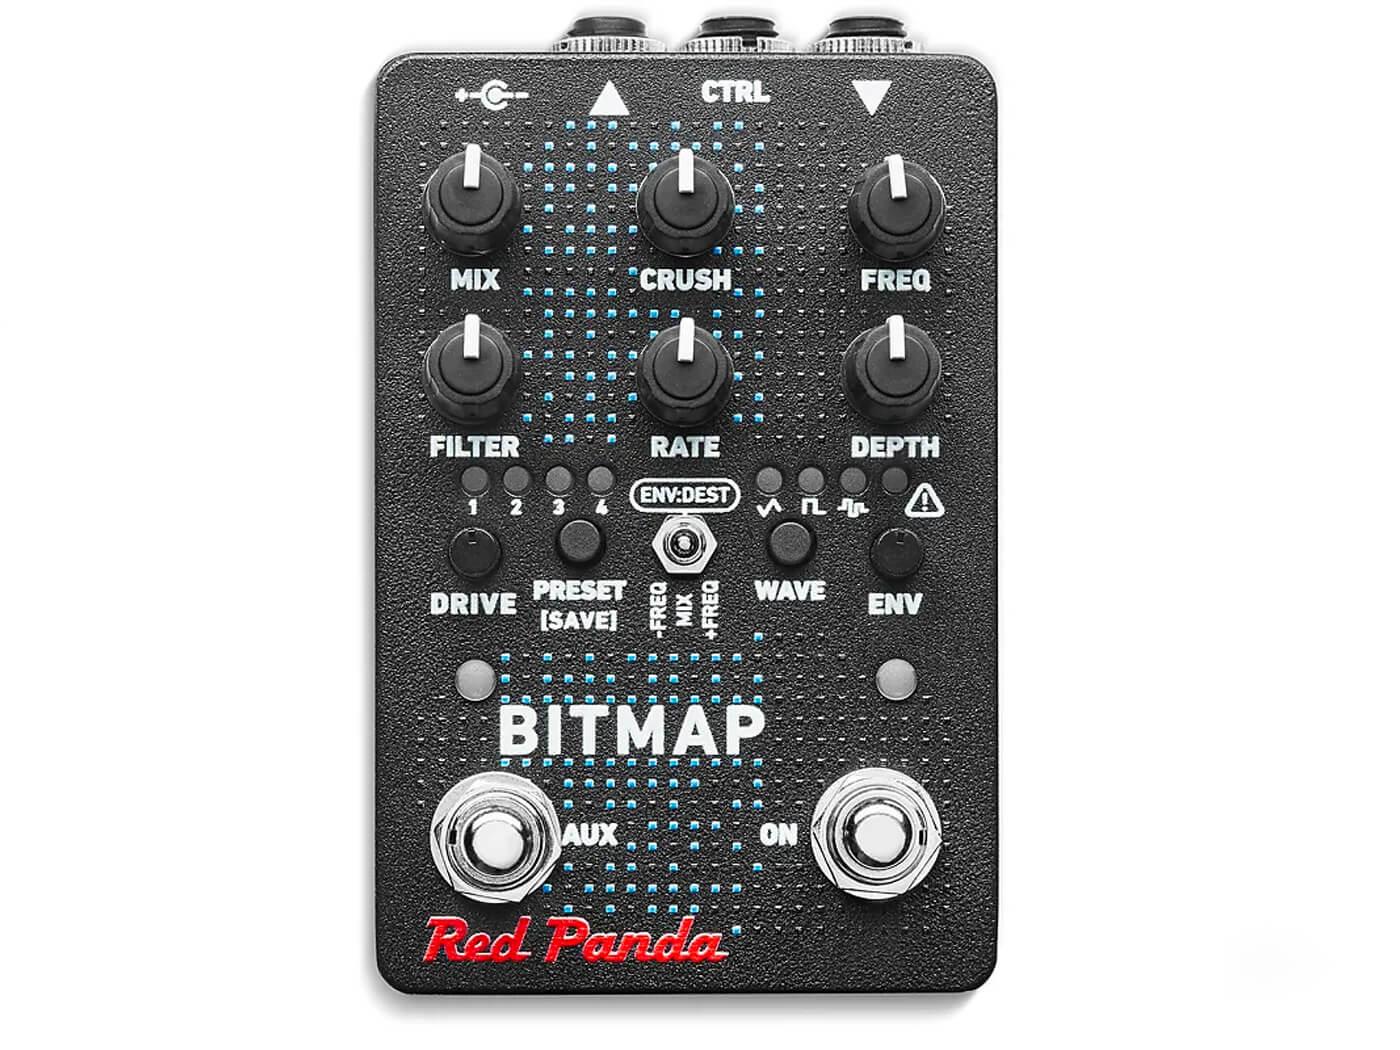 Red Panda Bitmap 2 Bit crusher stompbox